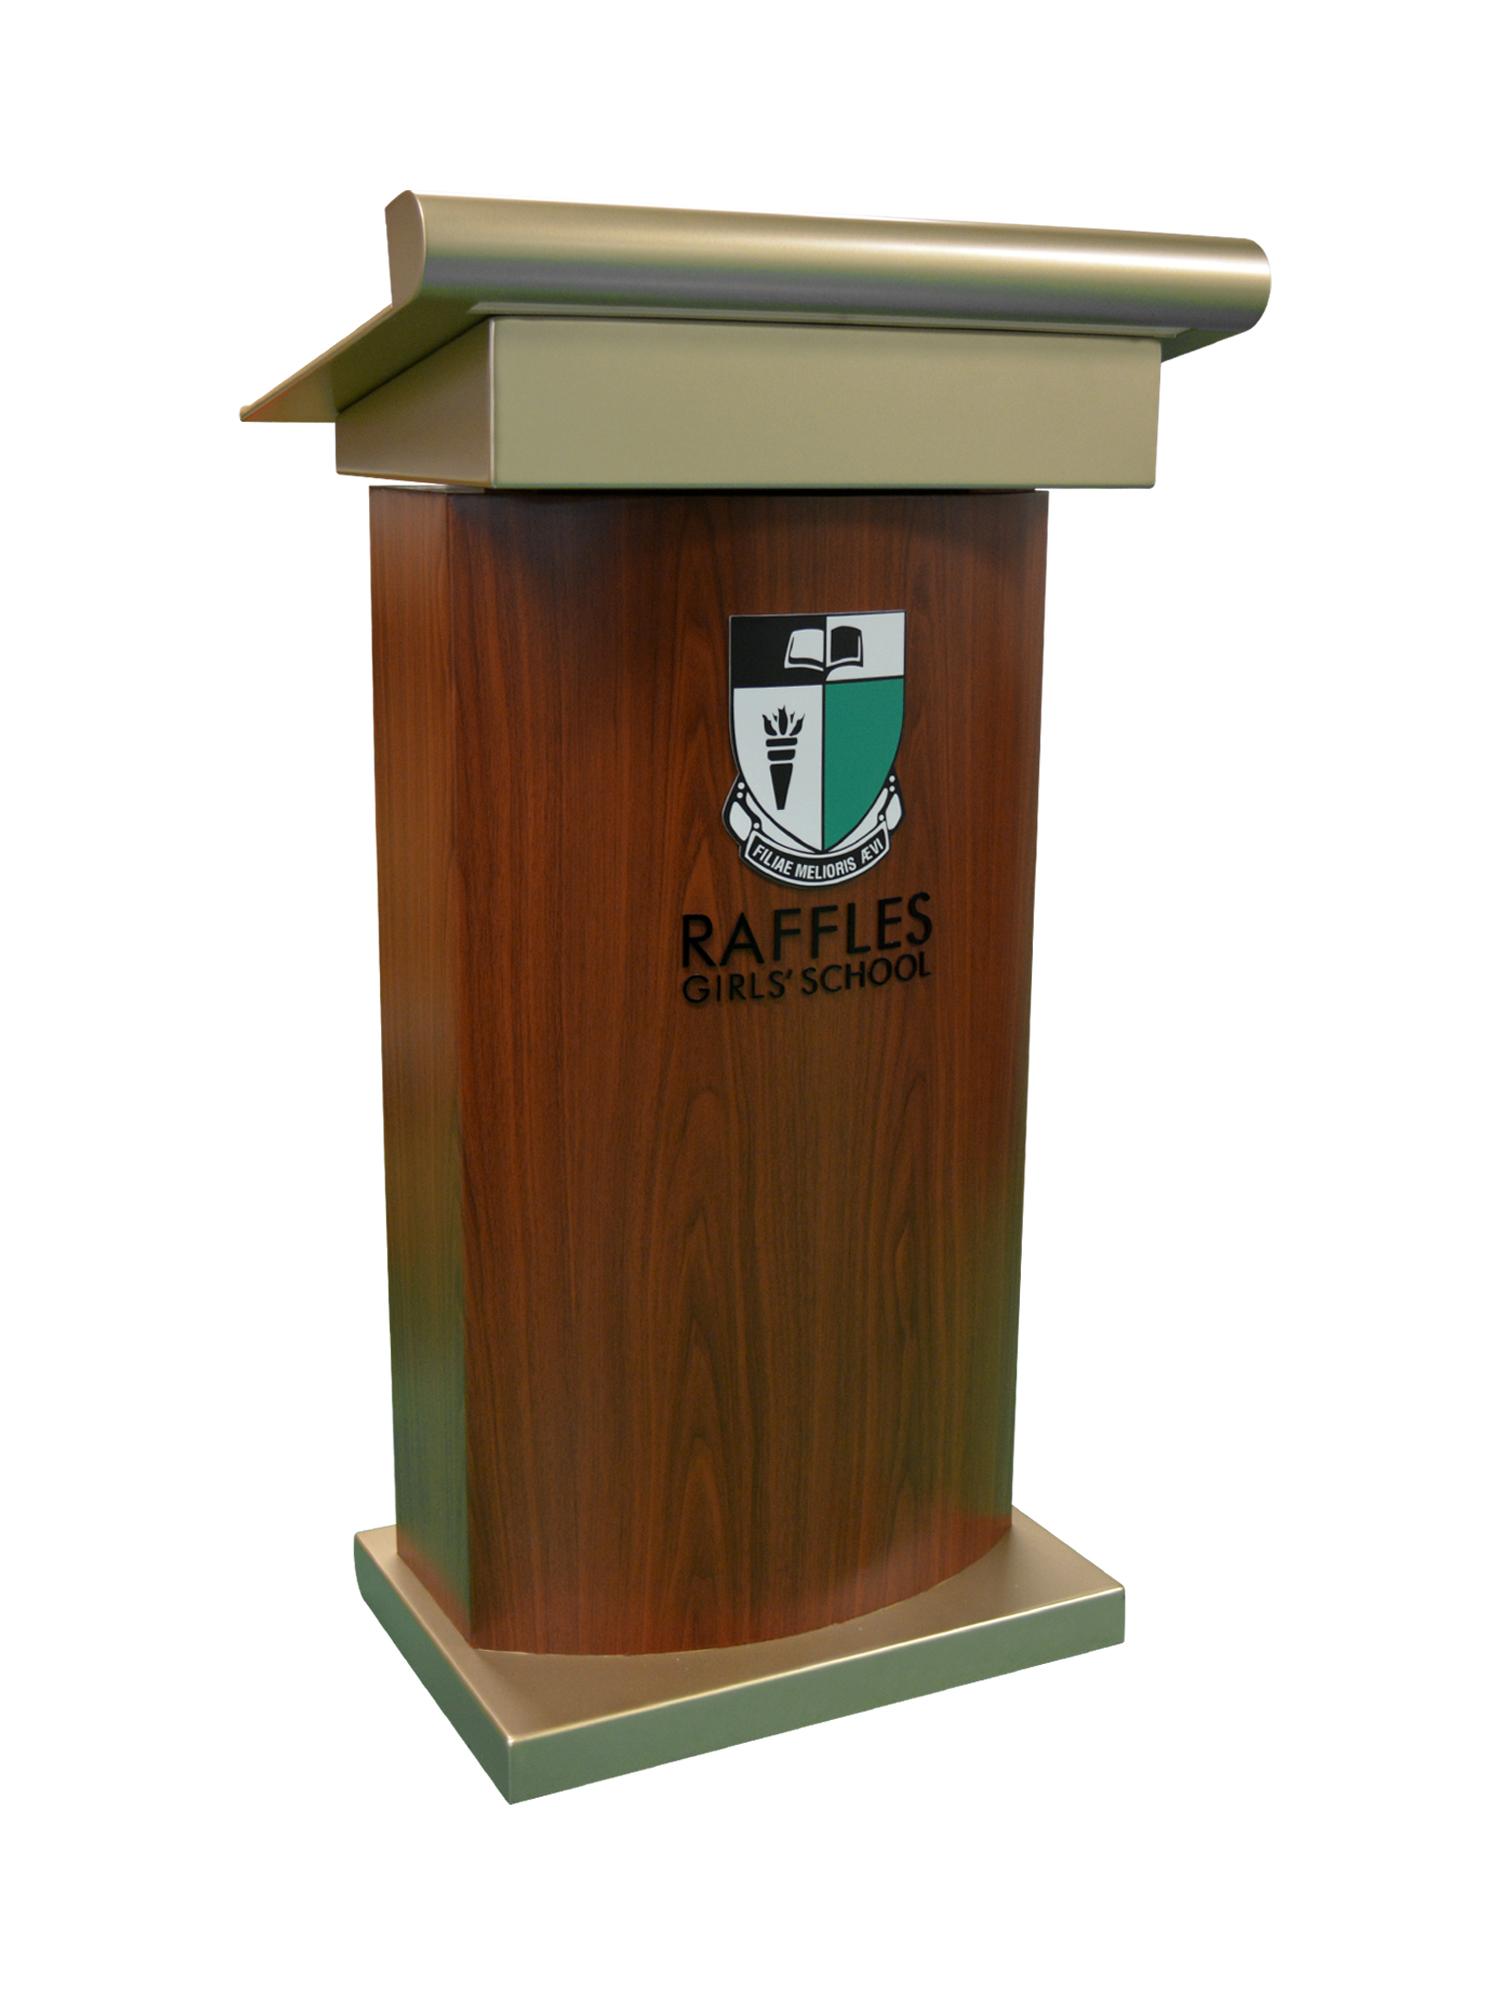 Raffles Girls' School